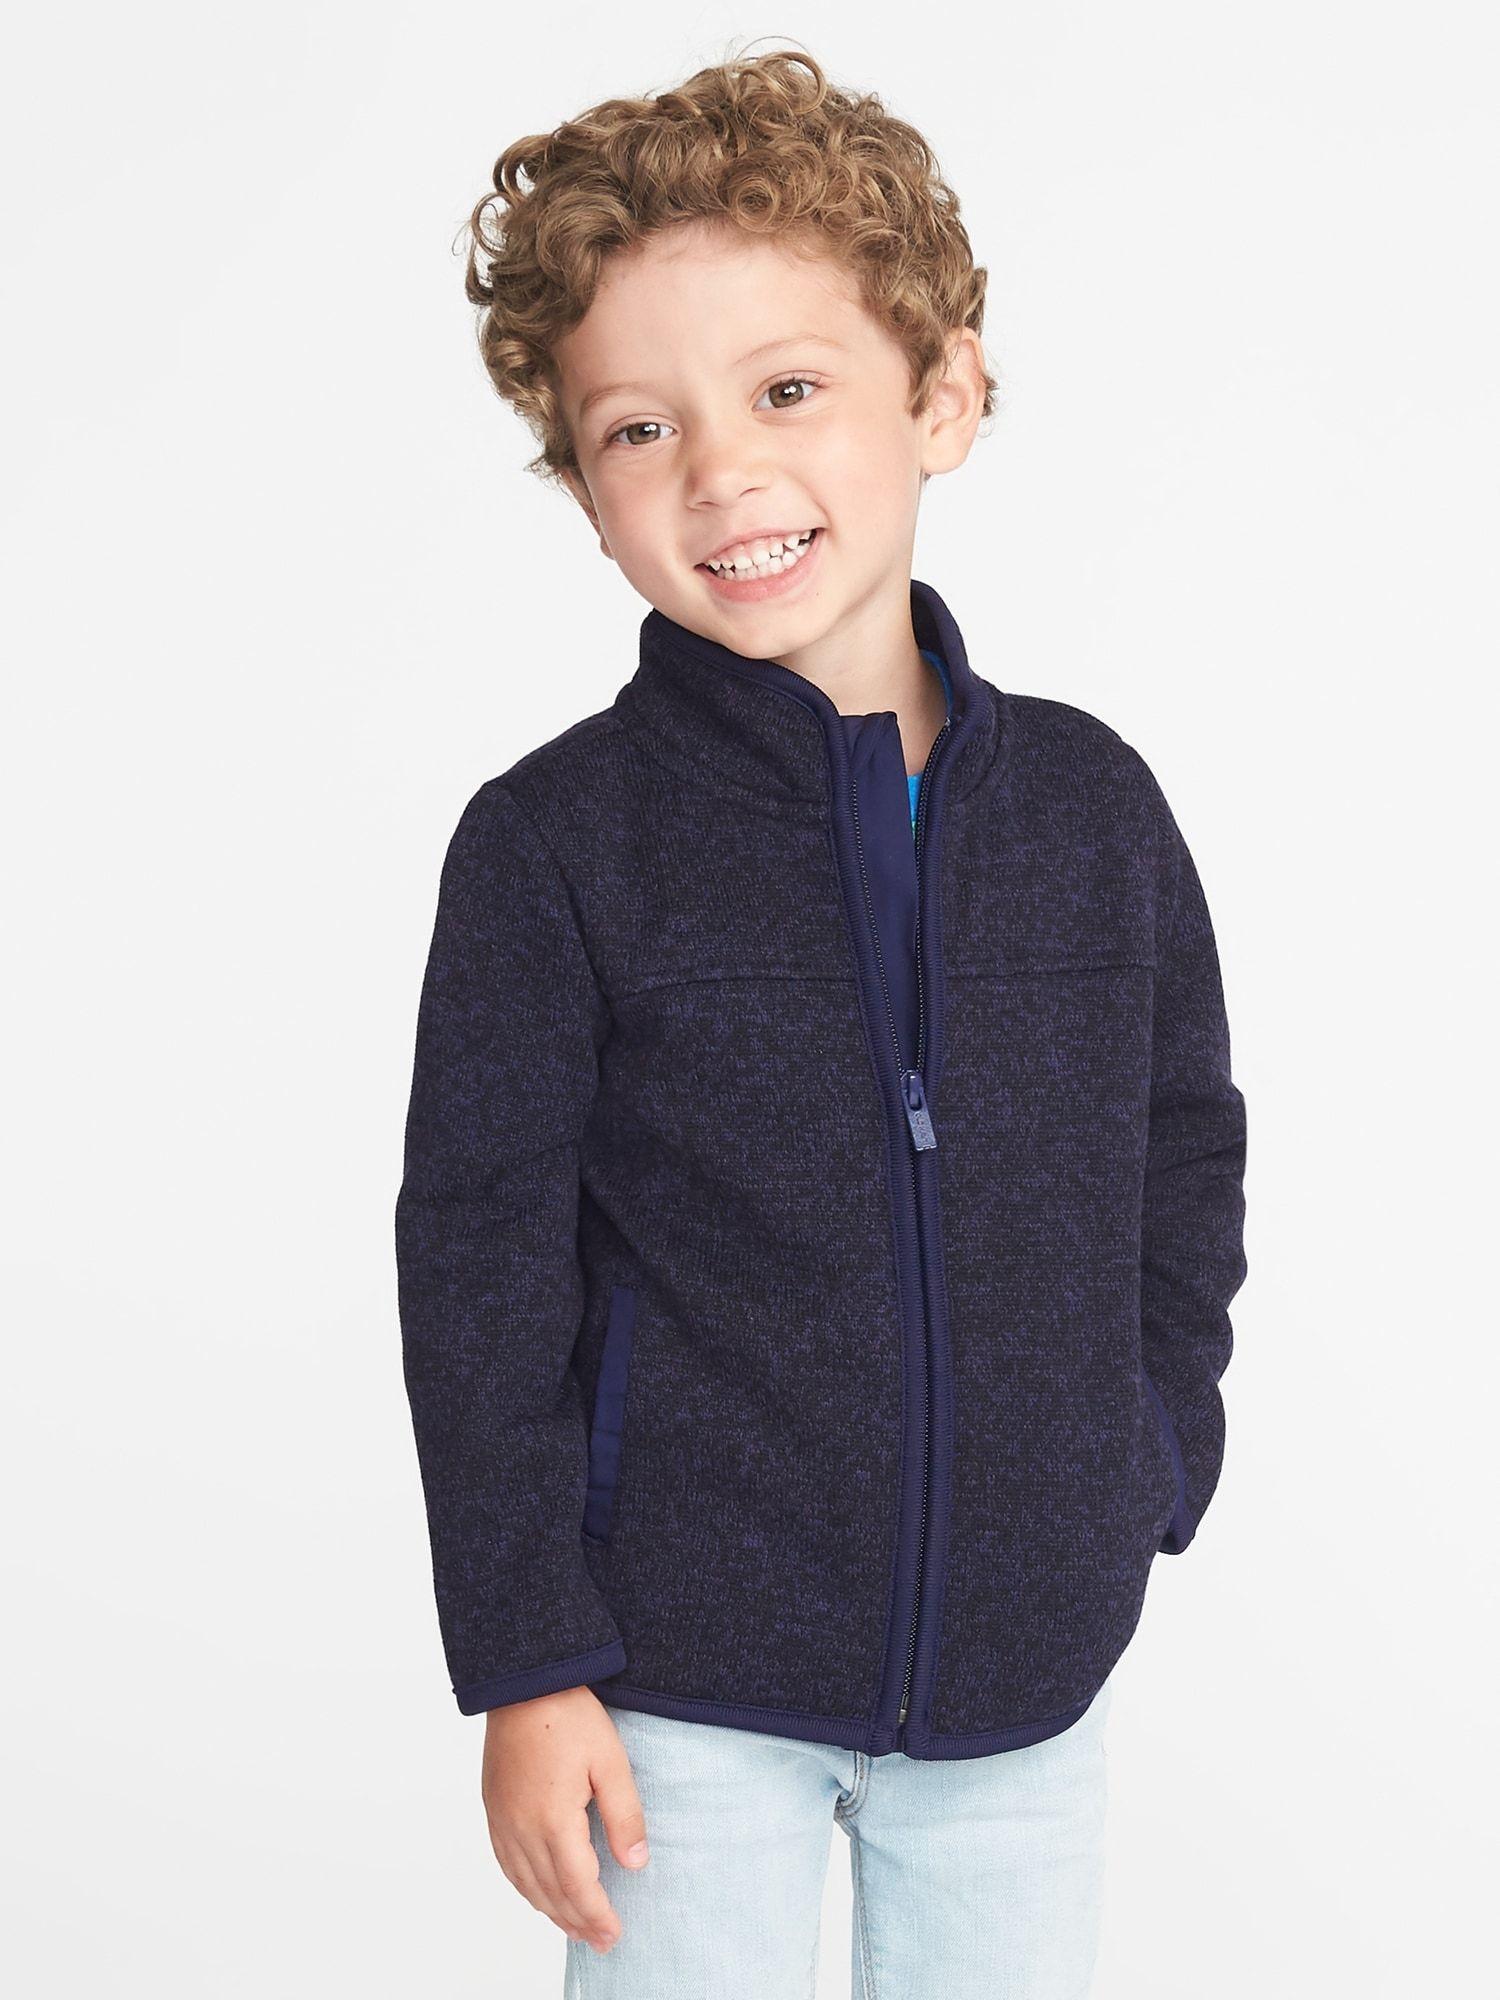 Fleece Knit Jacket For Toddler Boys Old Navy Kids Designer Dresses Boy Outerwear Toddler Boy Haircuts [ 2000 x 1500 Pixel ]